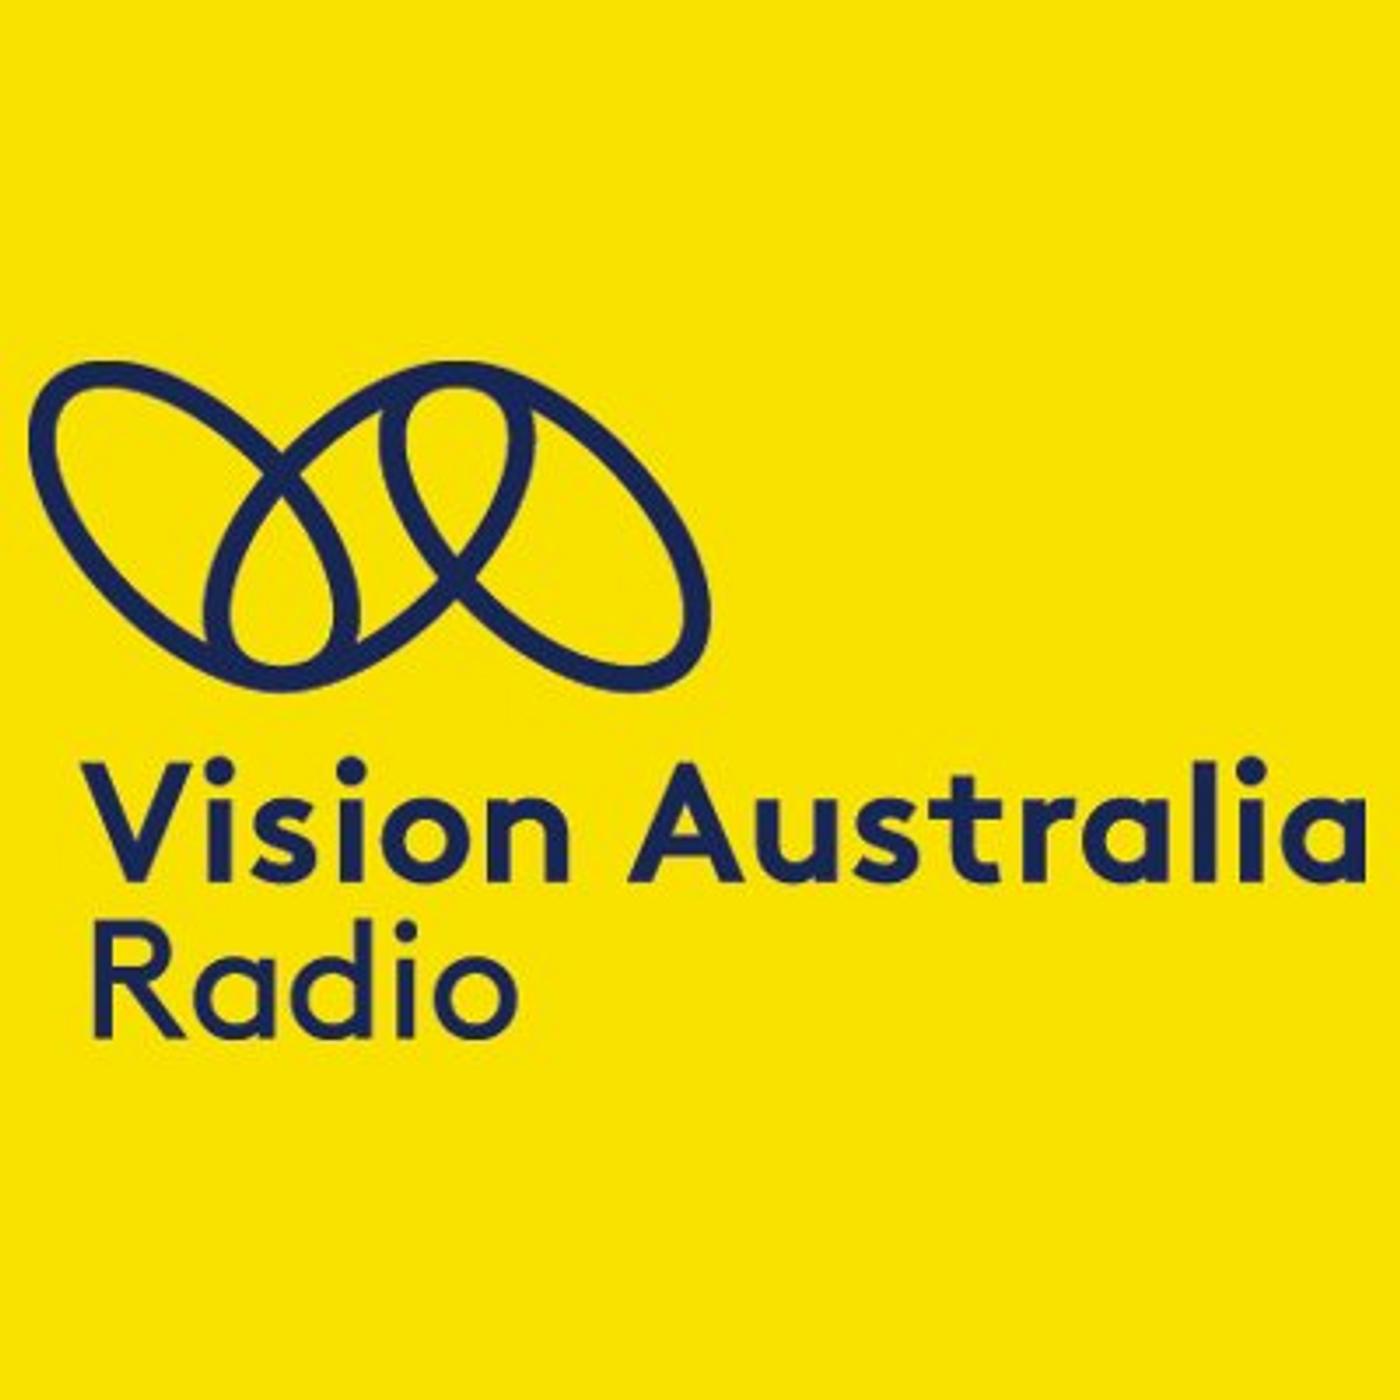 Riwzgipvrbqsir06wl2k vision aust.radio logo.com